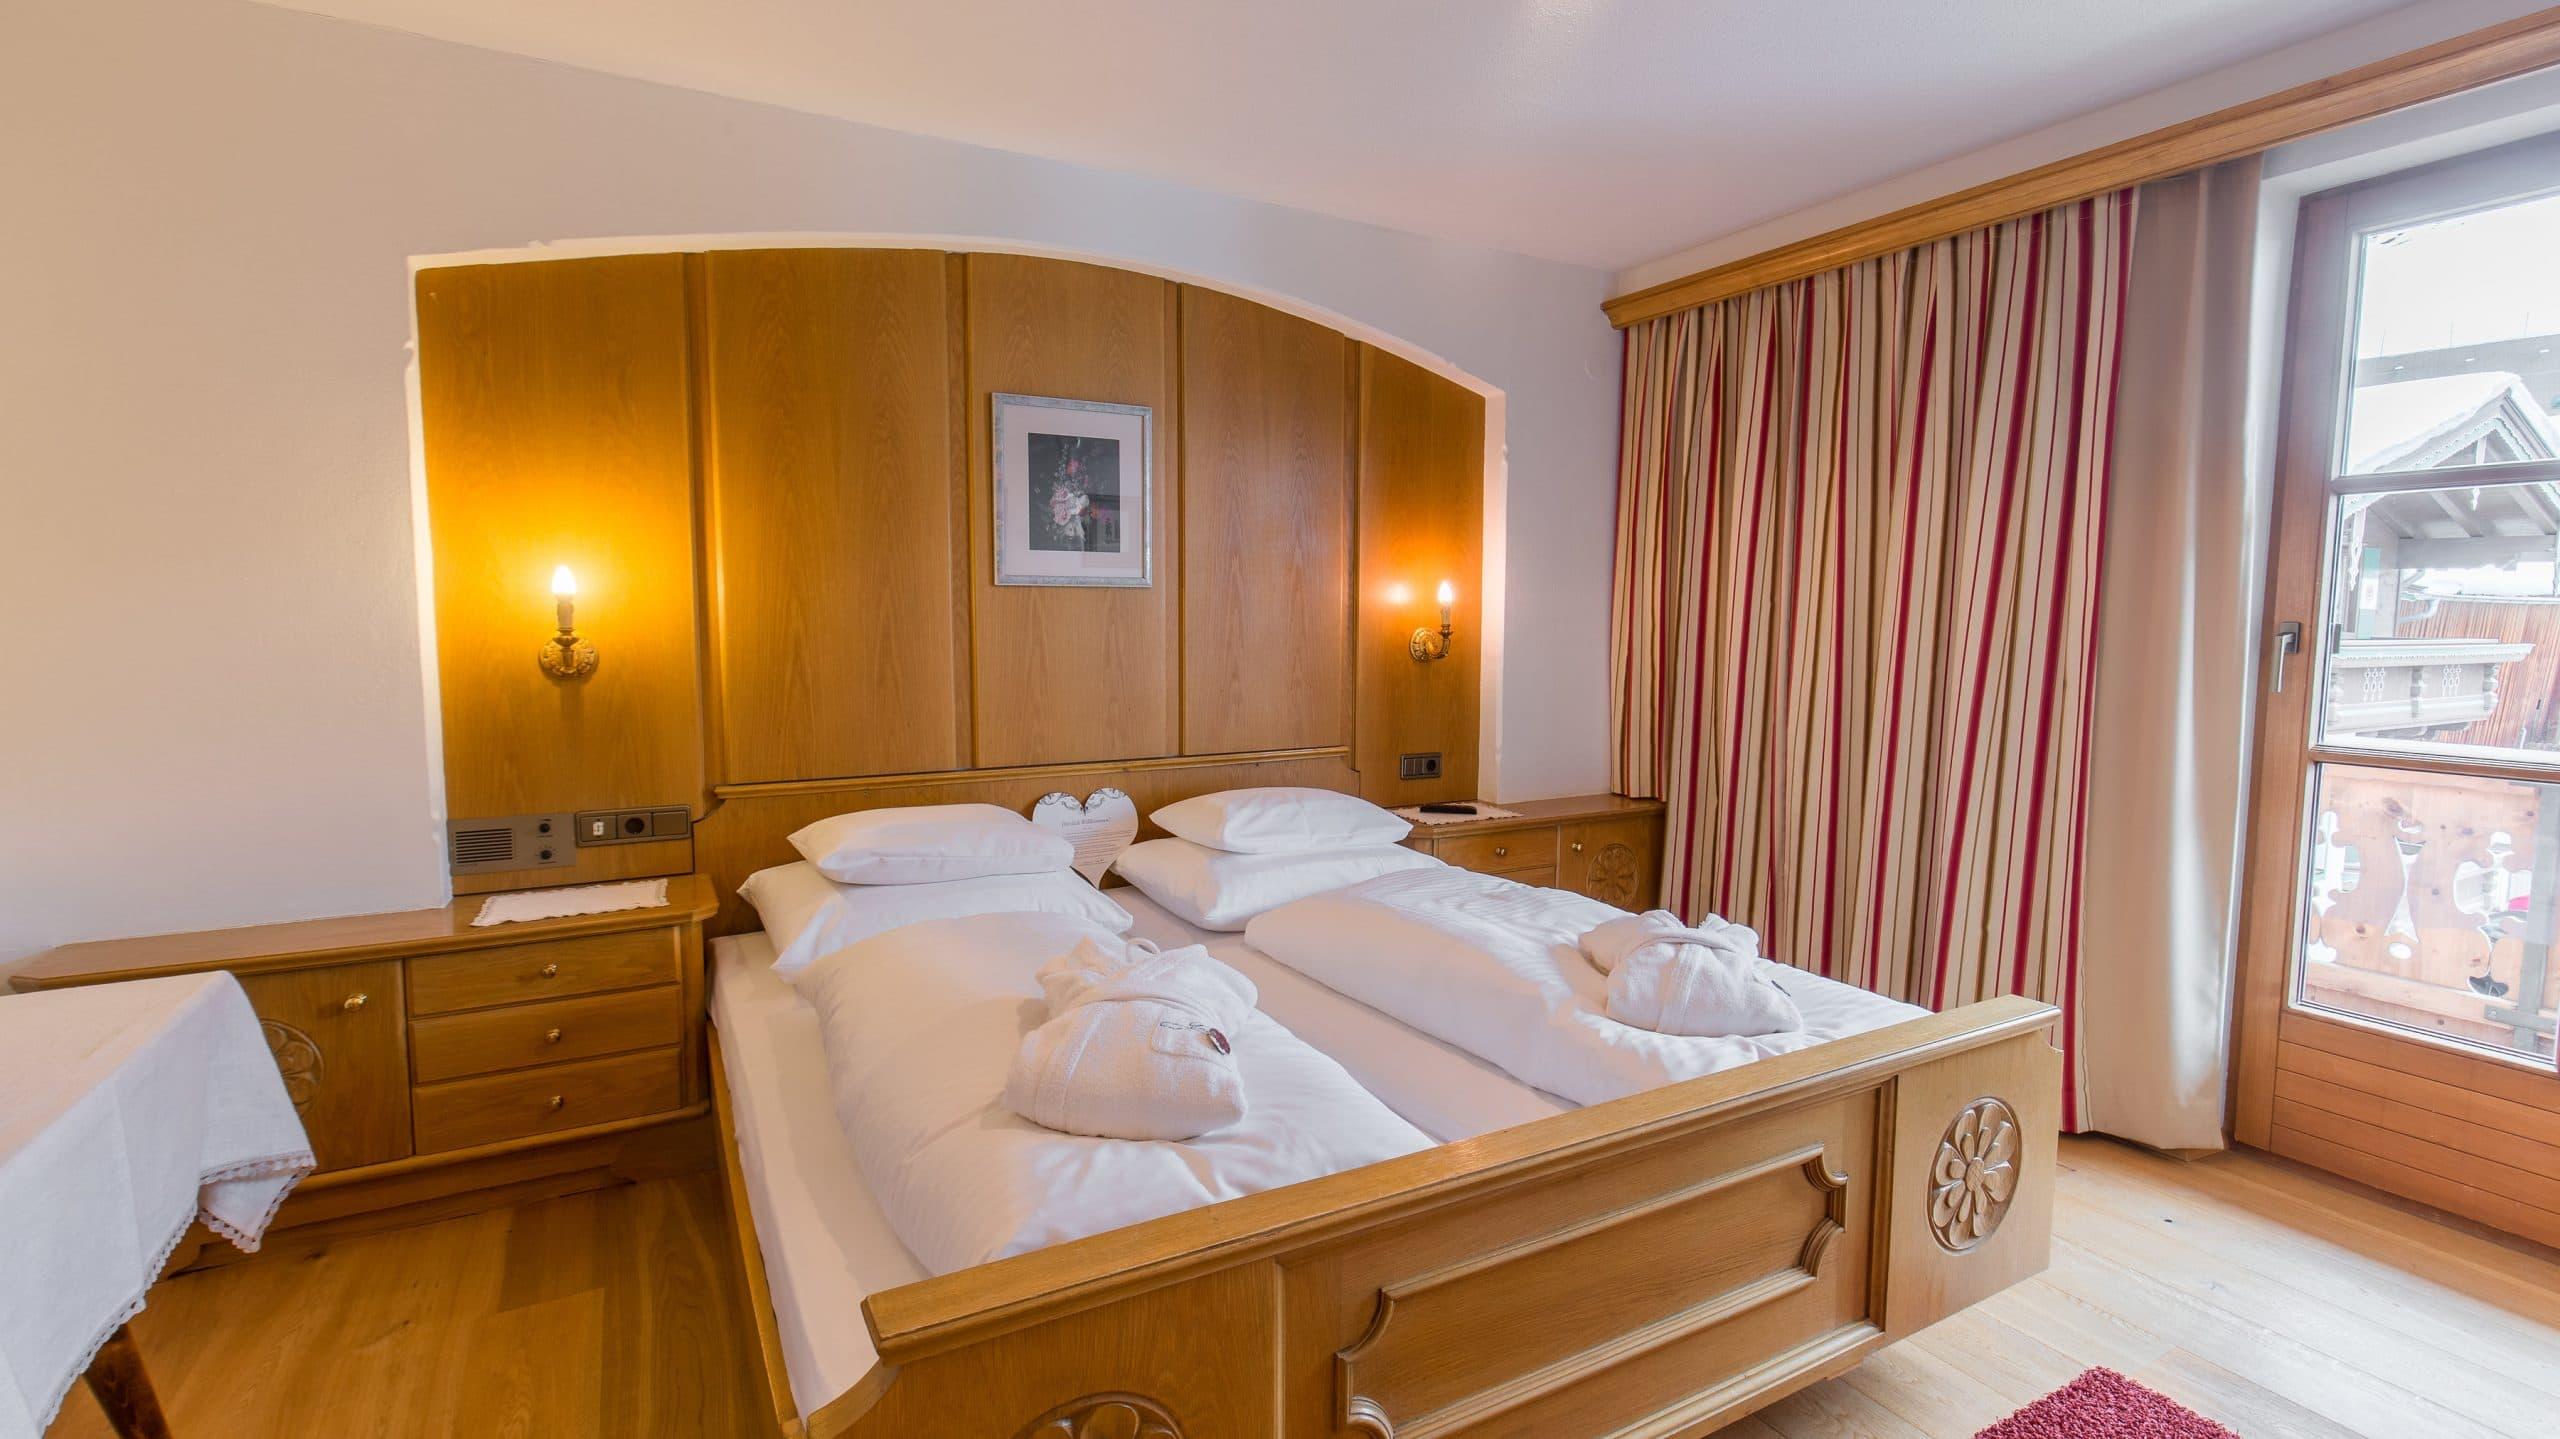 gaspingerhof highlights 2017 56 Zimmer 225 scaled